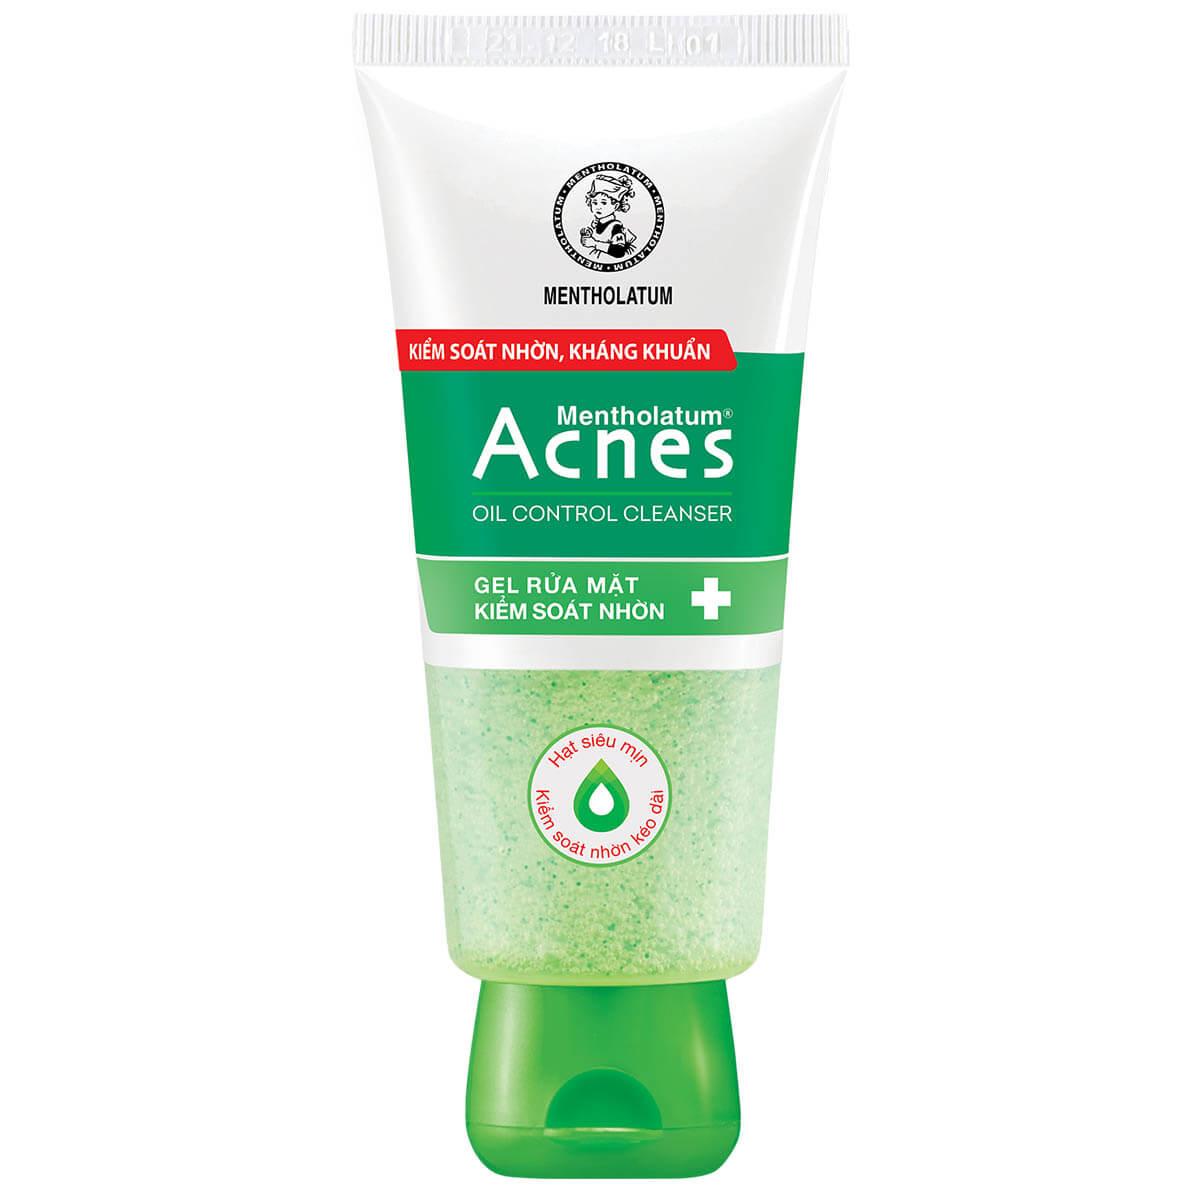 Gel rửa mặt kiểm soát nhờn Acnes Oil Control Cleanser tuýp 50g